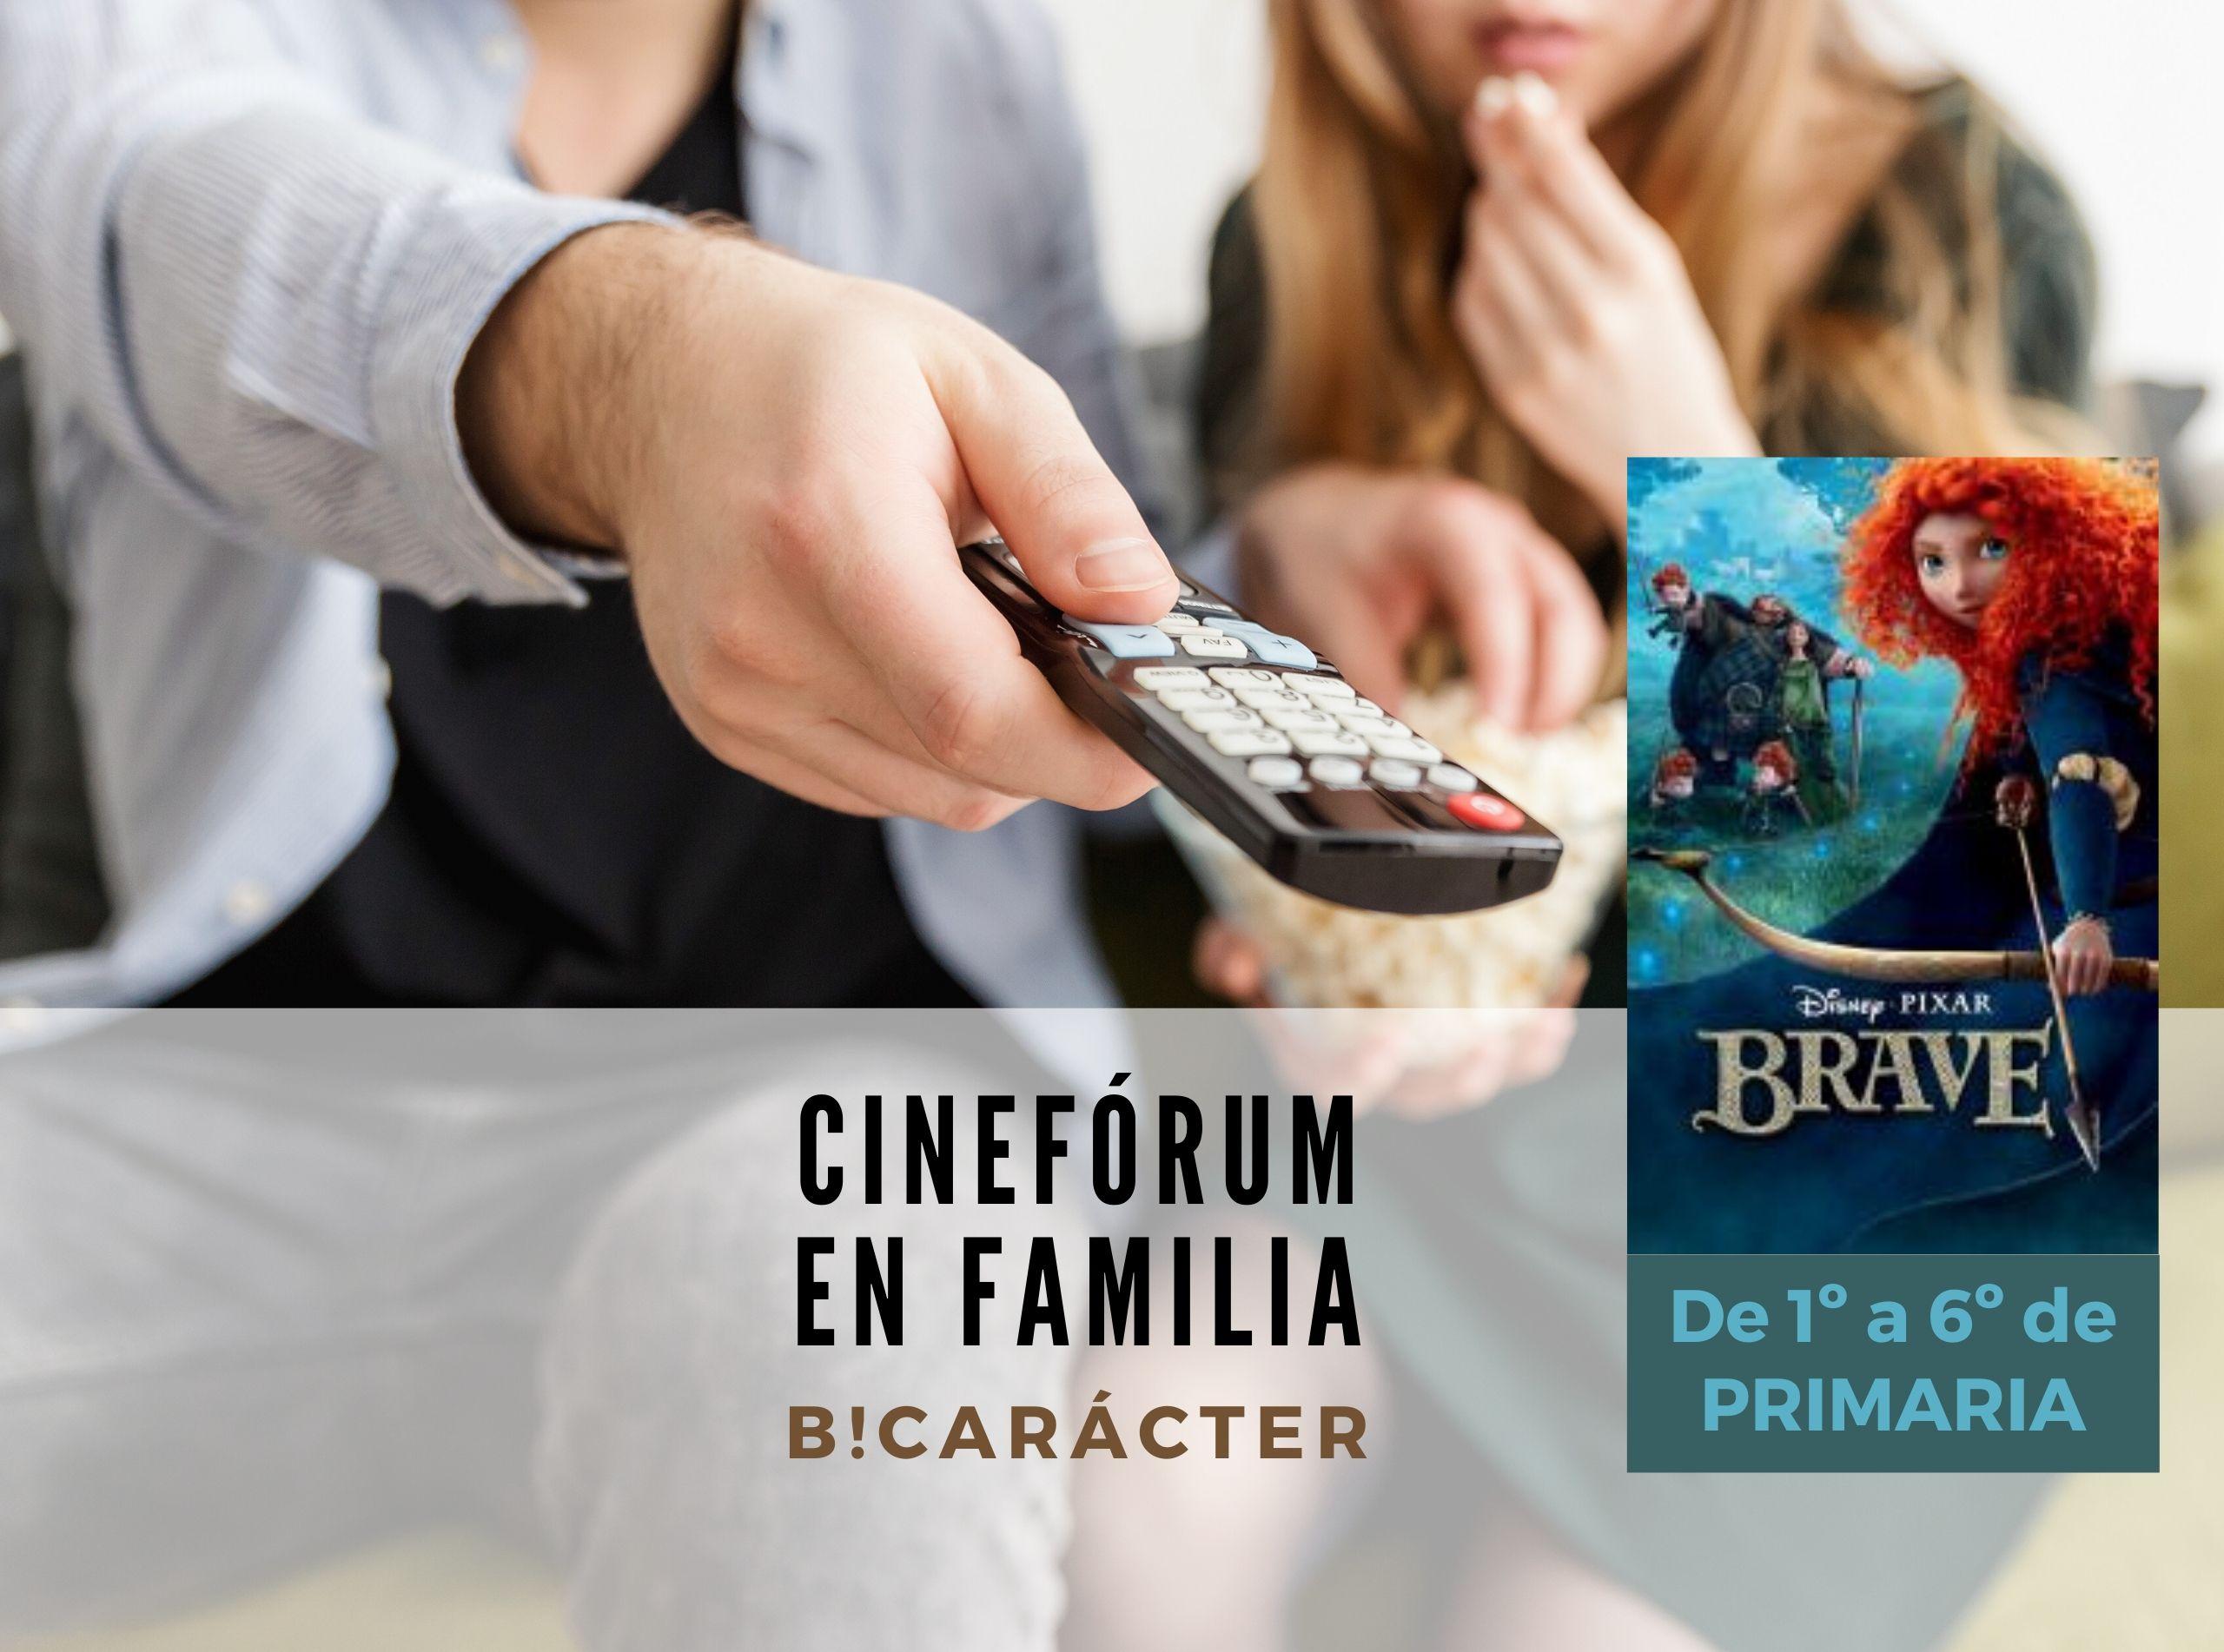 Cinefórum en familia para Primaria: Brave (Indomable)